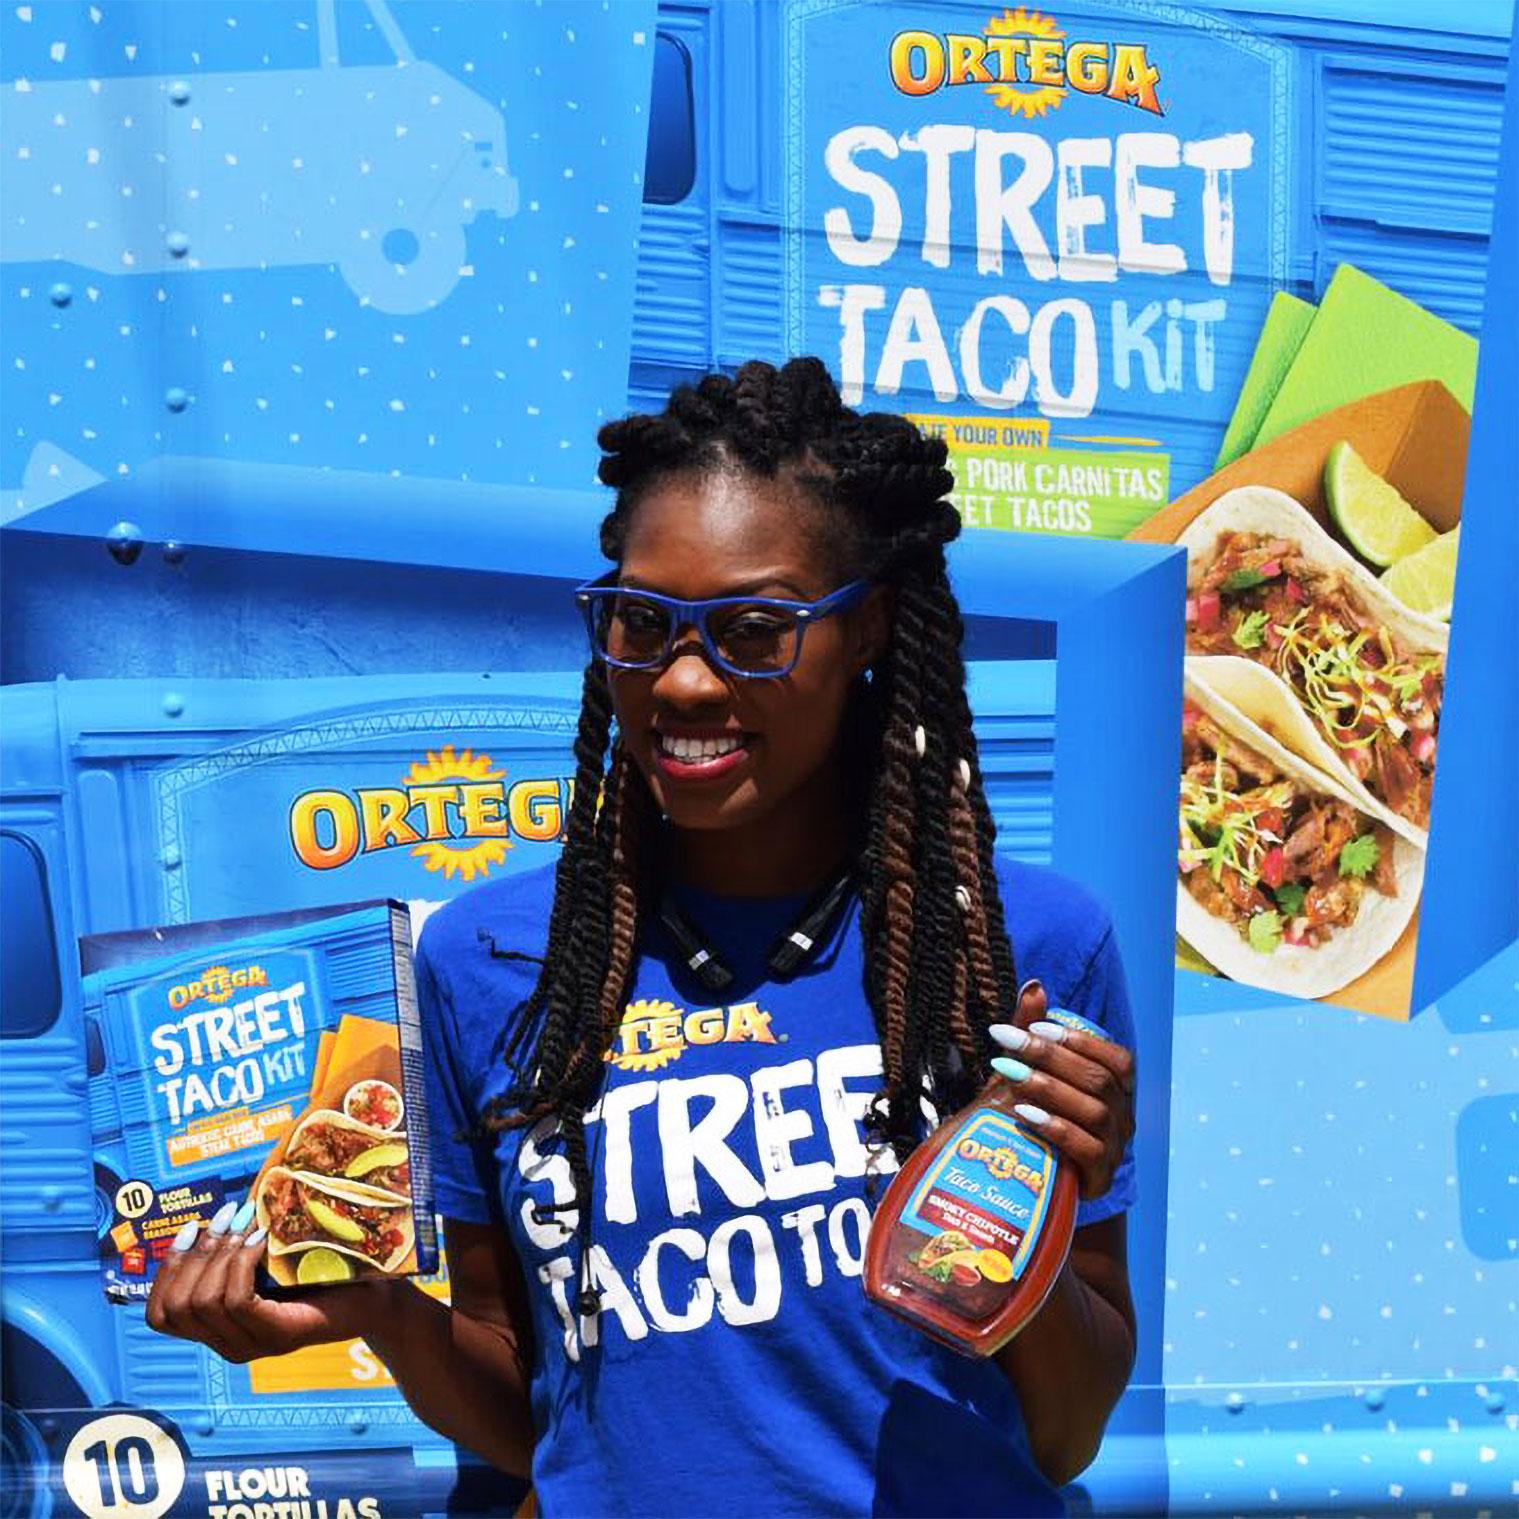 ortega-taco-truck-brand-ambassador.jpg